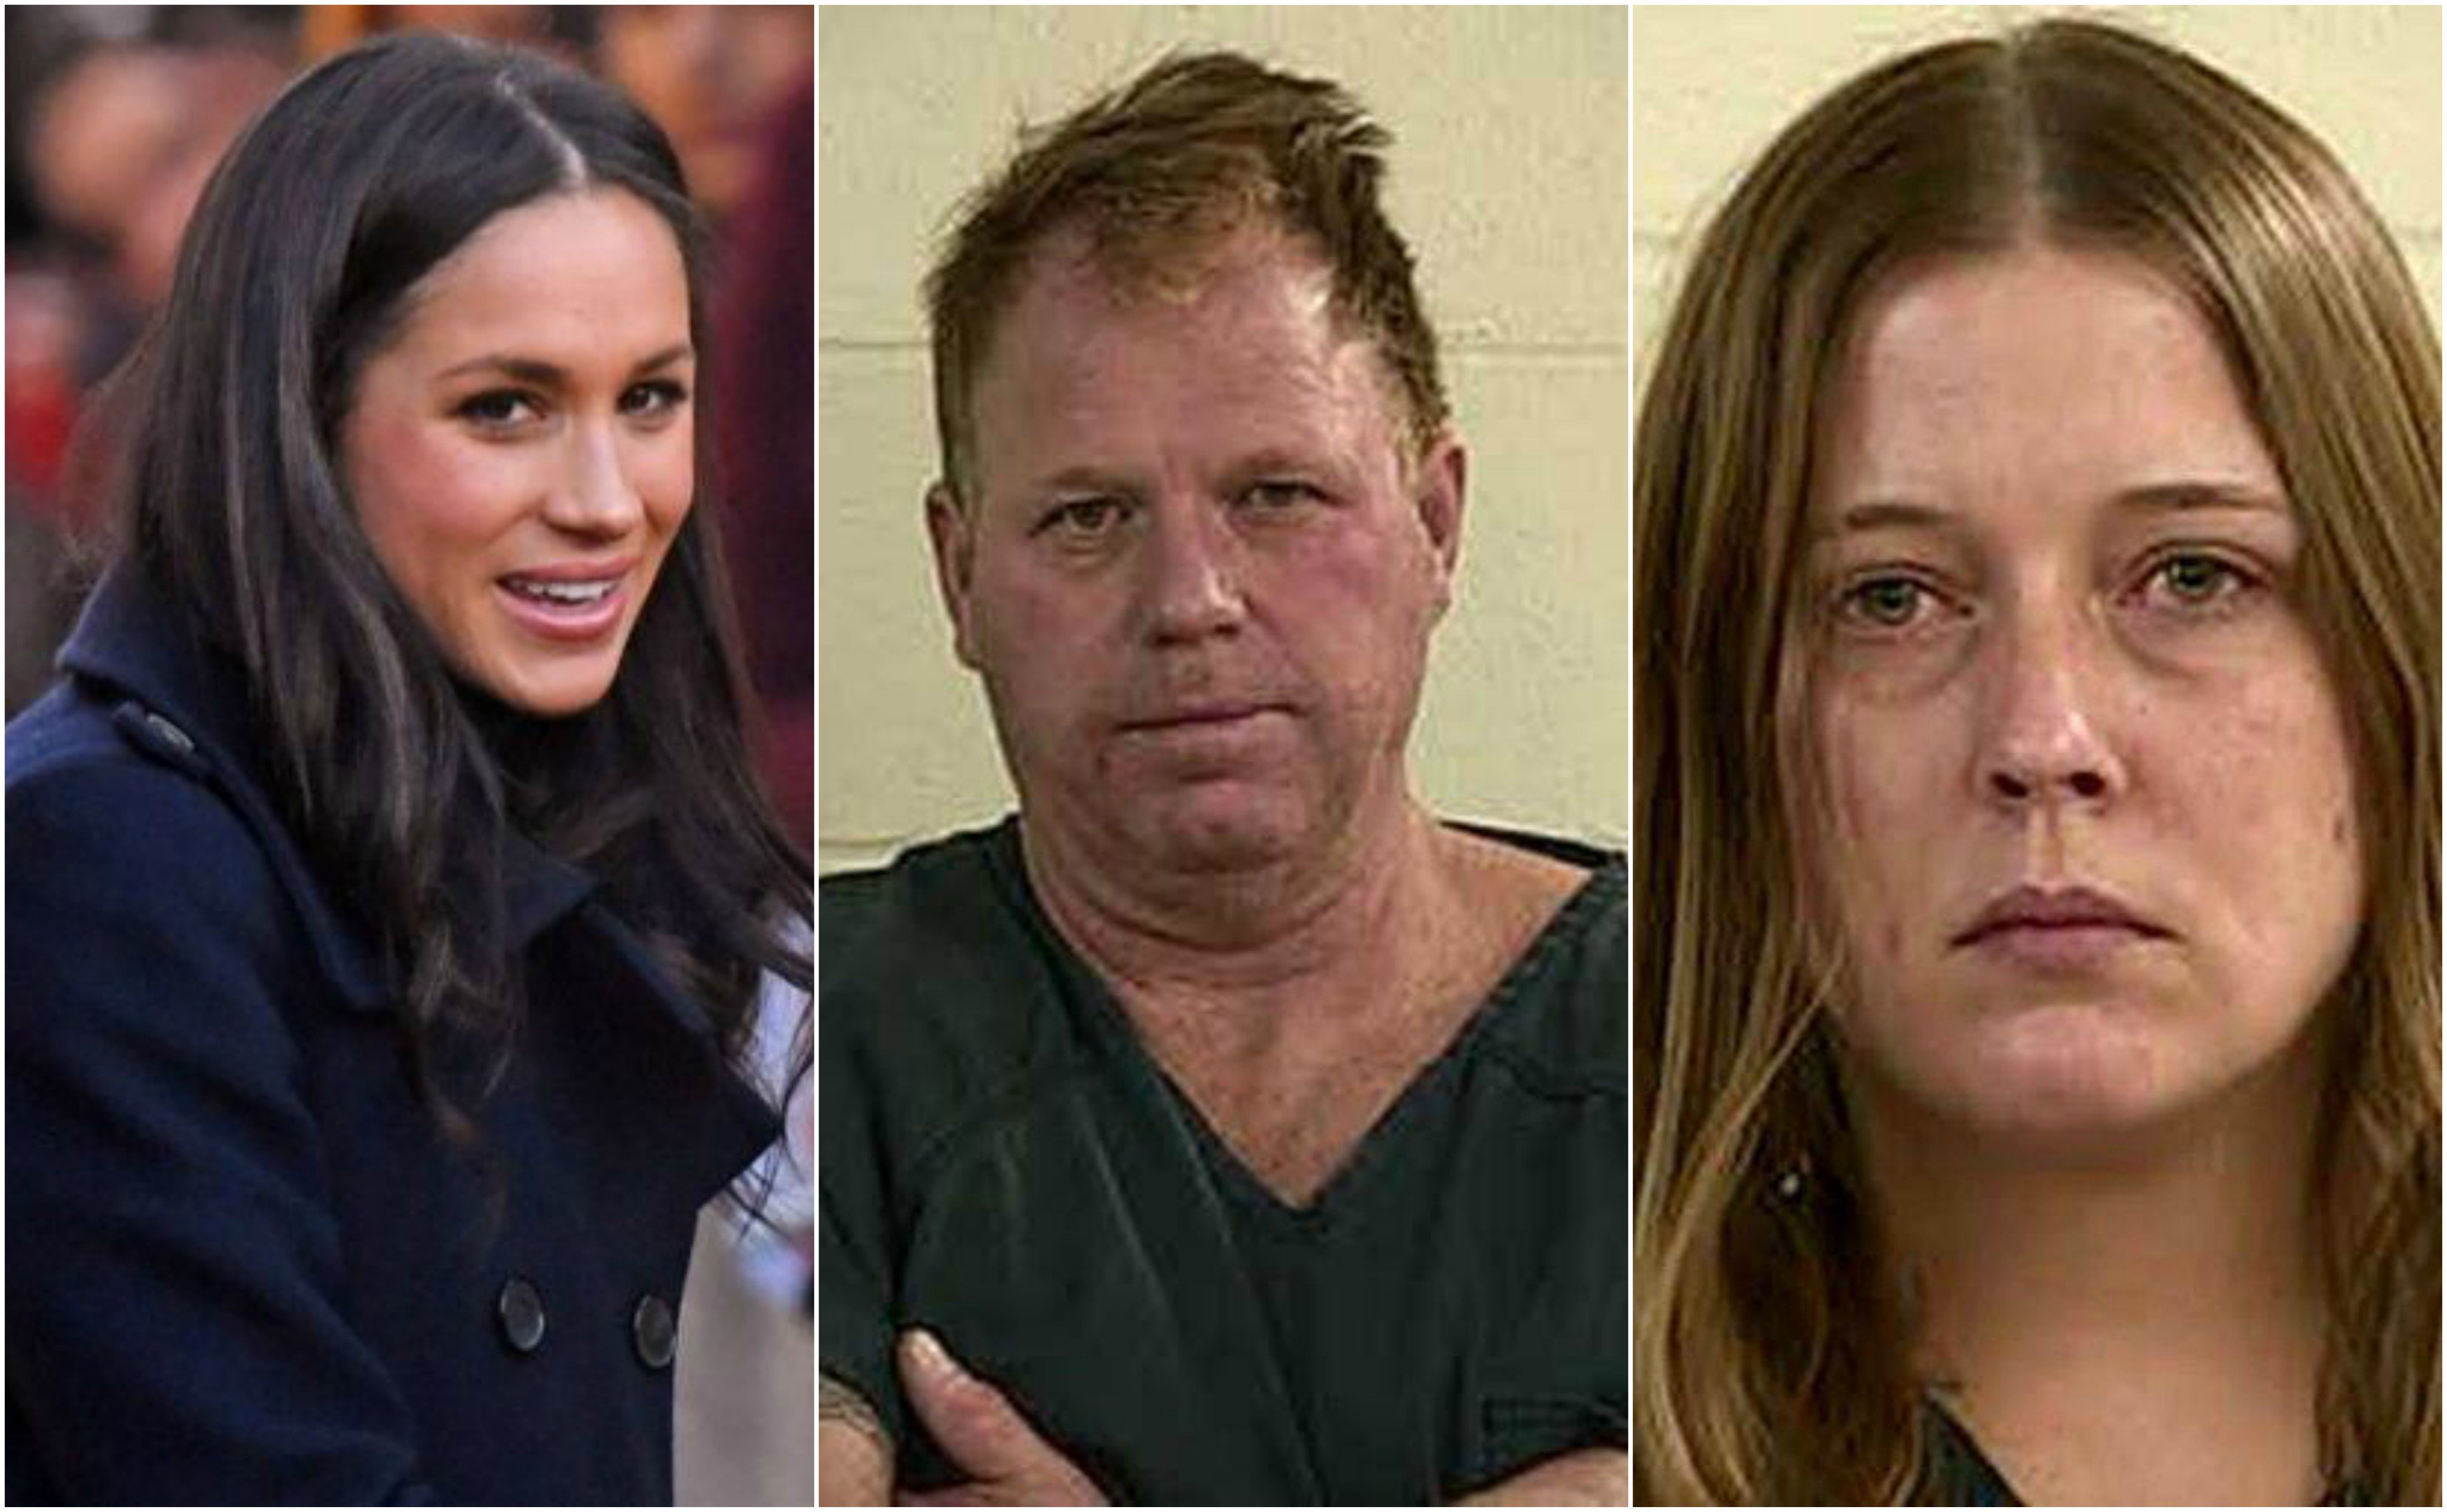 meghan markle thomas markle jr e darlene blount.jpg?resize=300,169 - ¡Metieron presa a la cuñada de Meghan Markle por violencia doméstica!